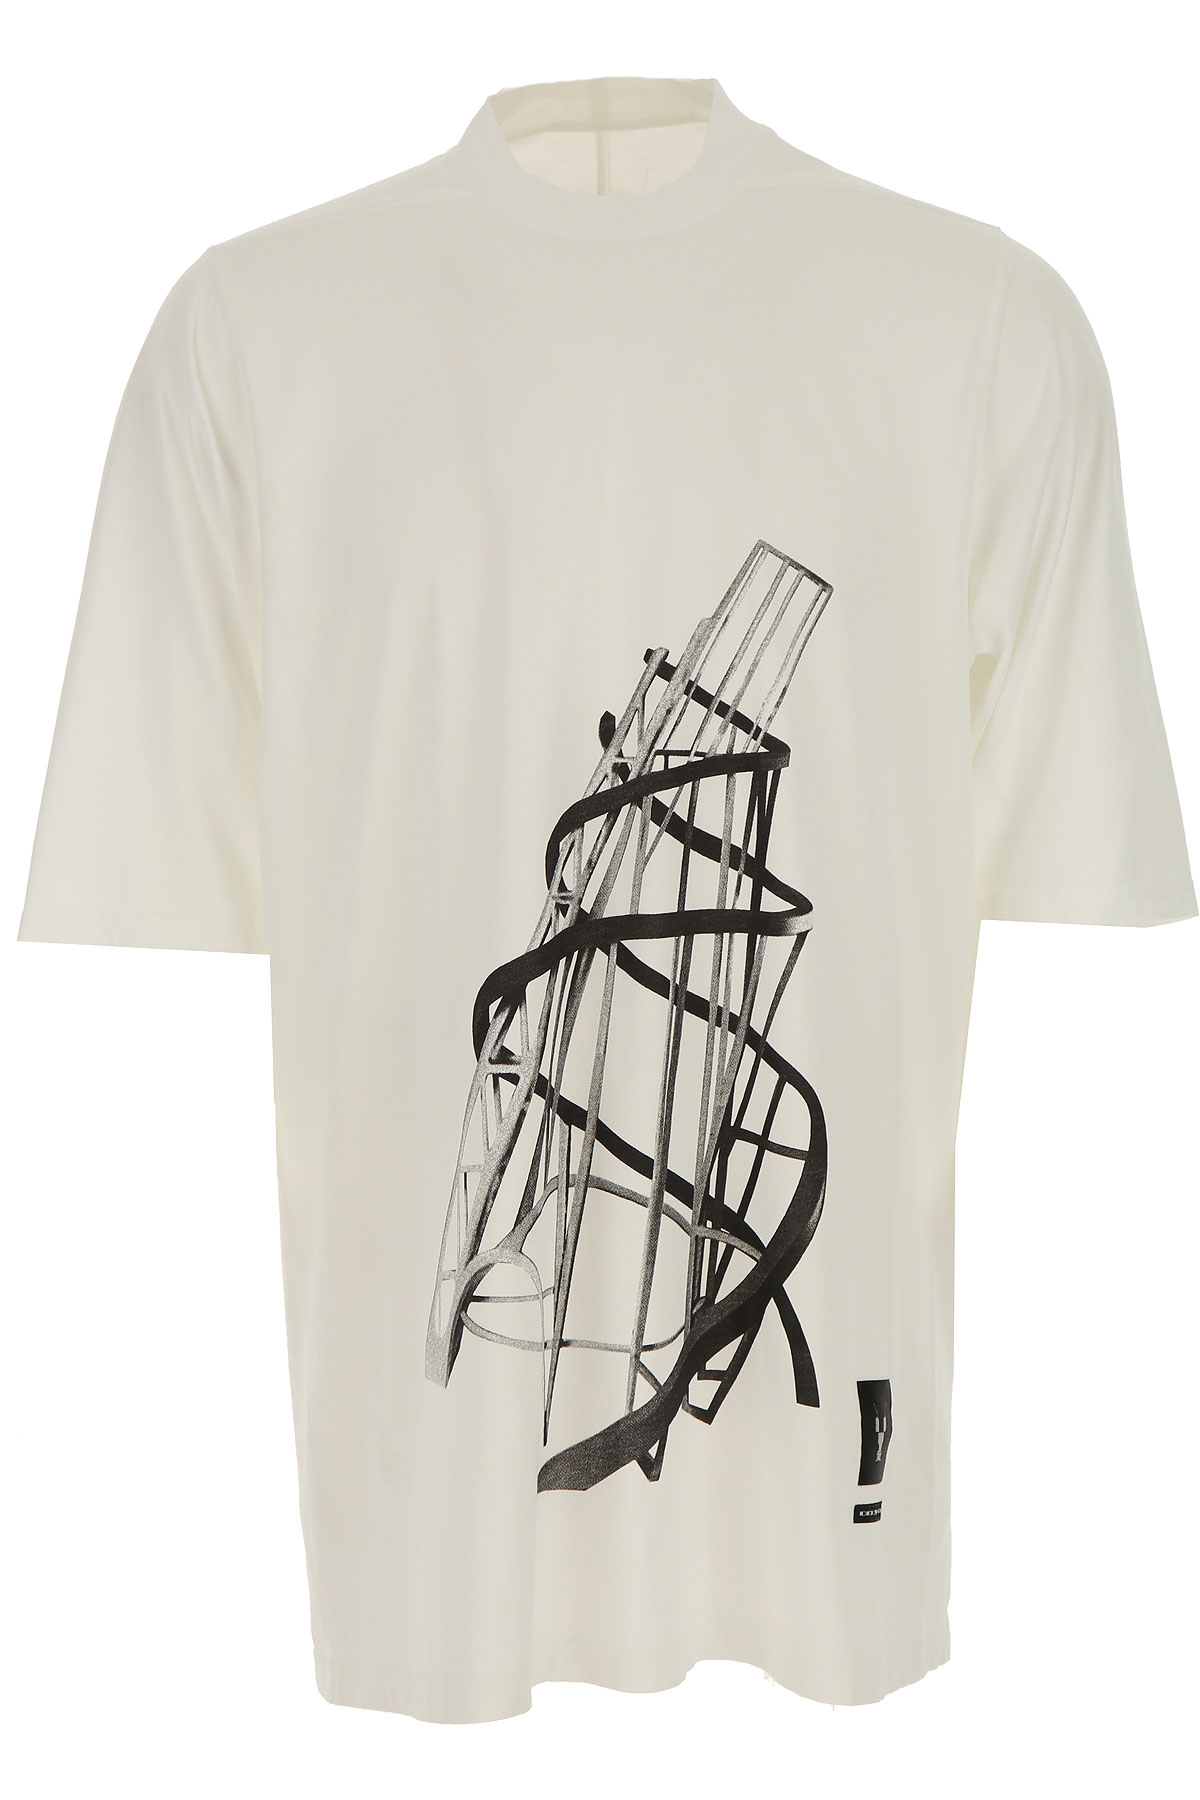 Rick Owens DRKSHDW T-Shirt for Men On Sale in Outlet, Milk, Cotton, 2019, L S XL